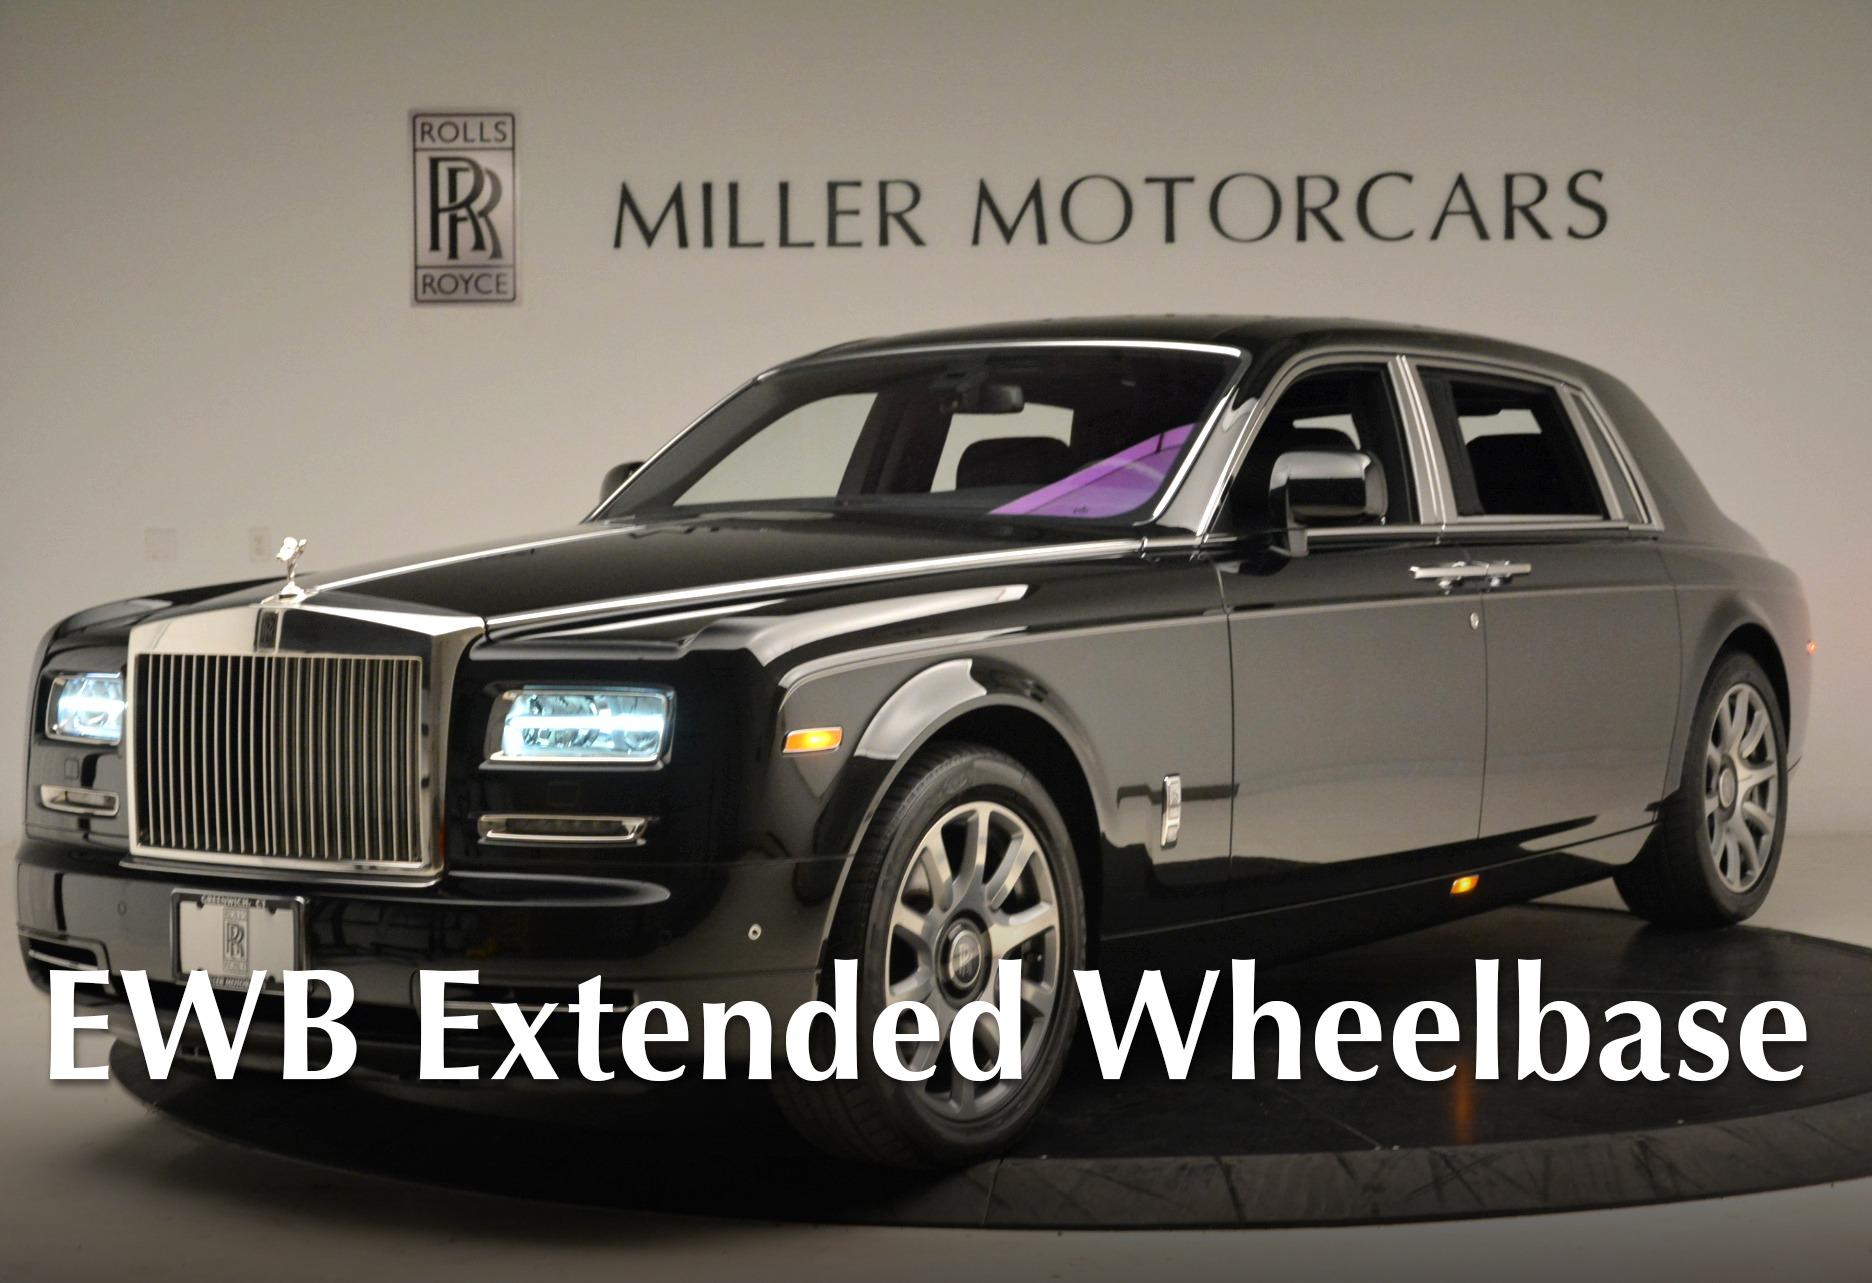 Used 2014 Rolls-Royce Phantom EWB for sale Sold at Bentley Greenwich in Greenwich CT 06830 1